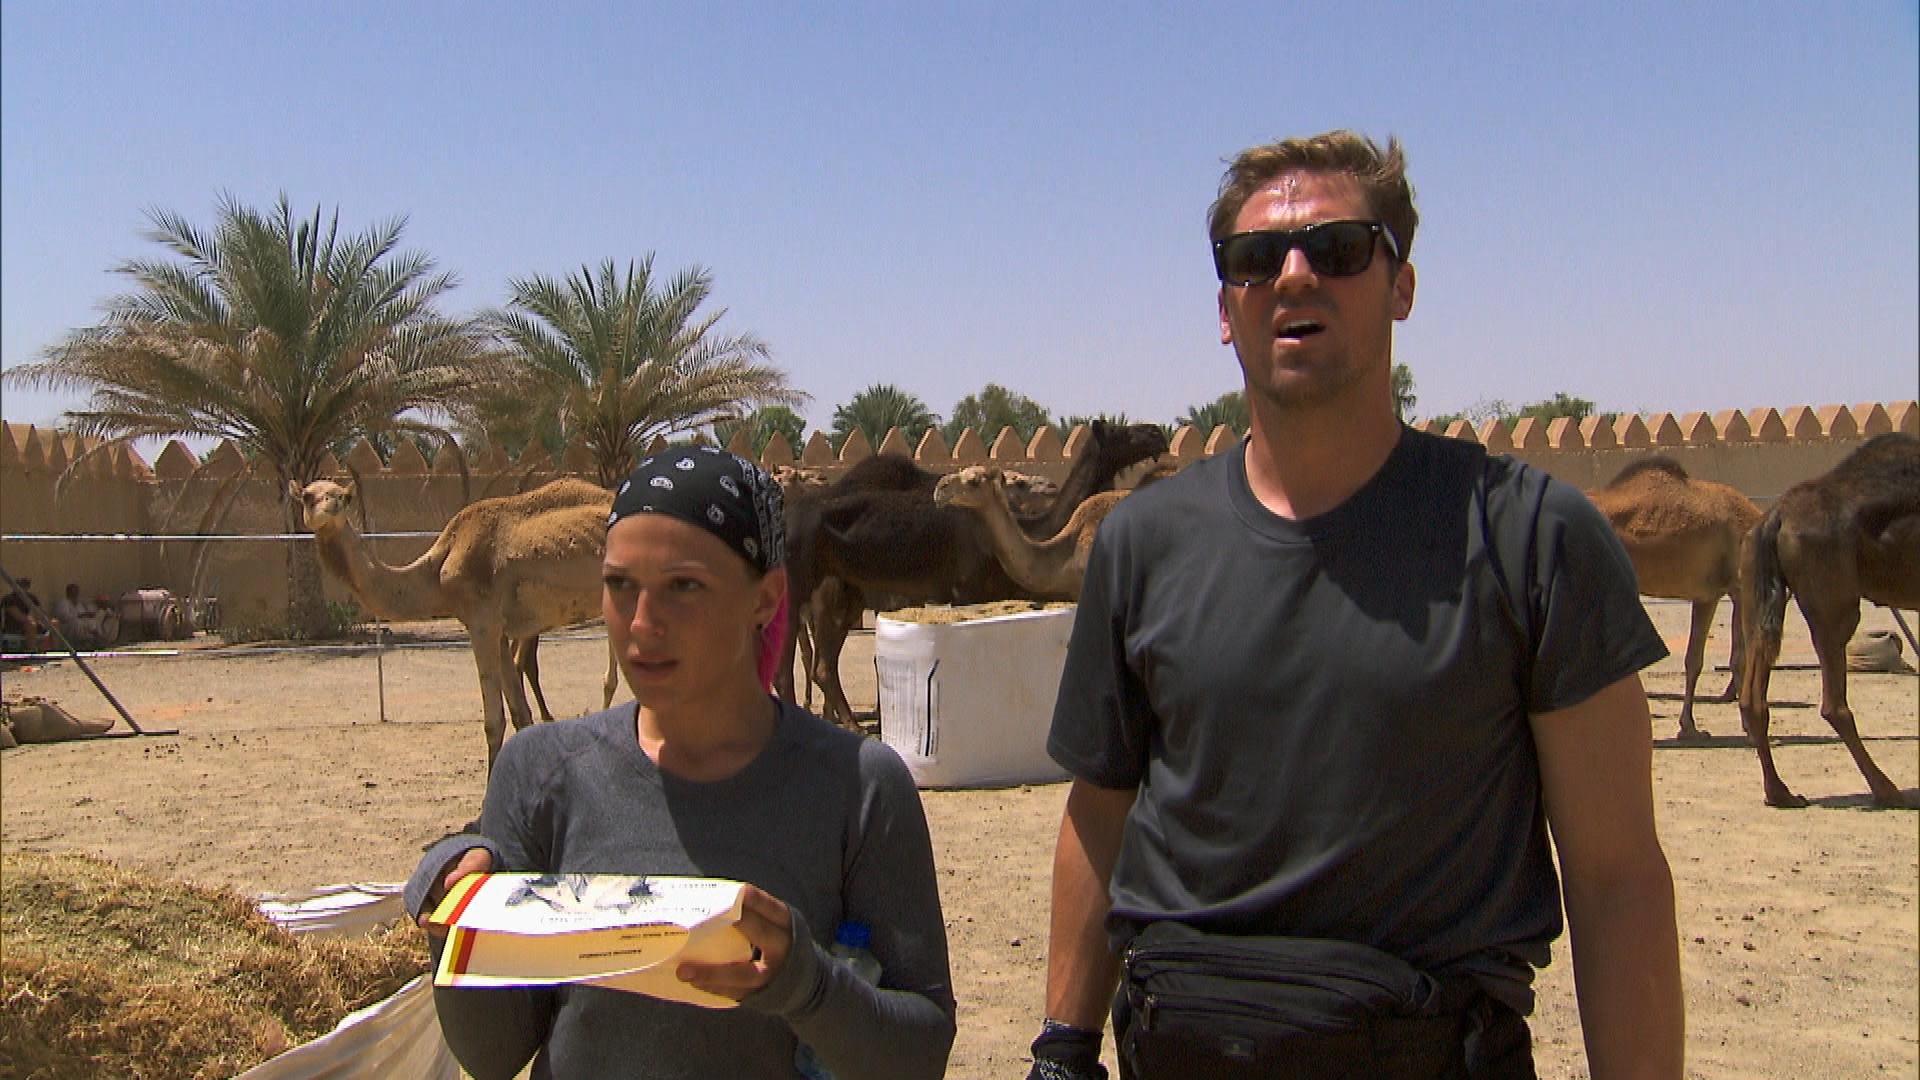 Judging a camel beauty contest